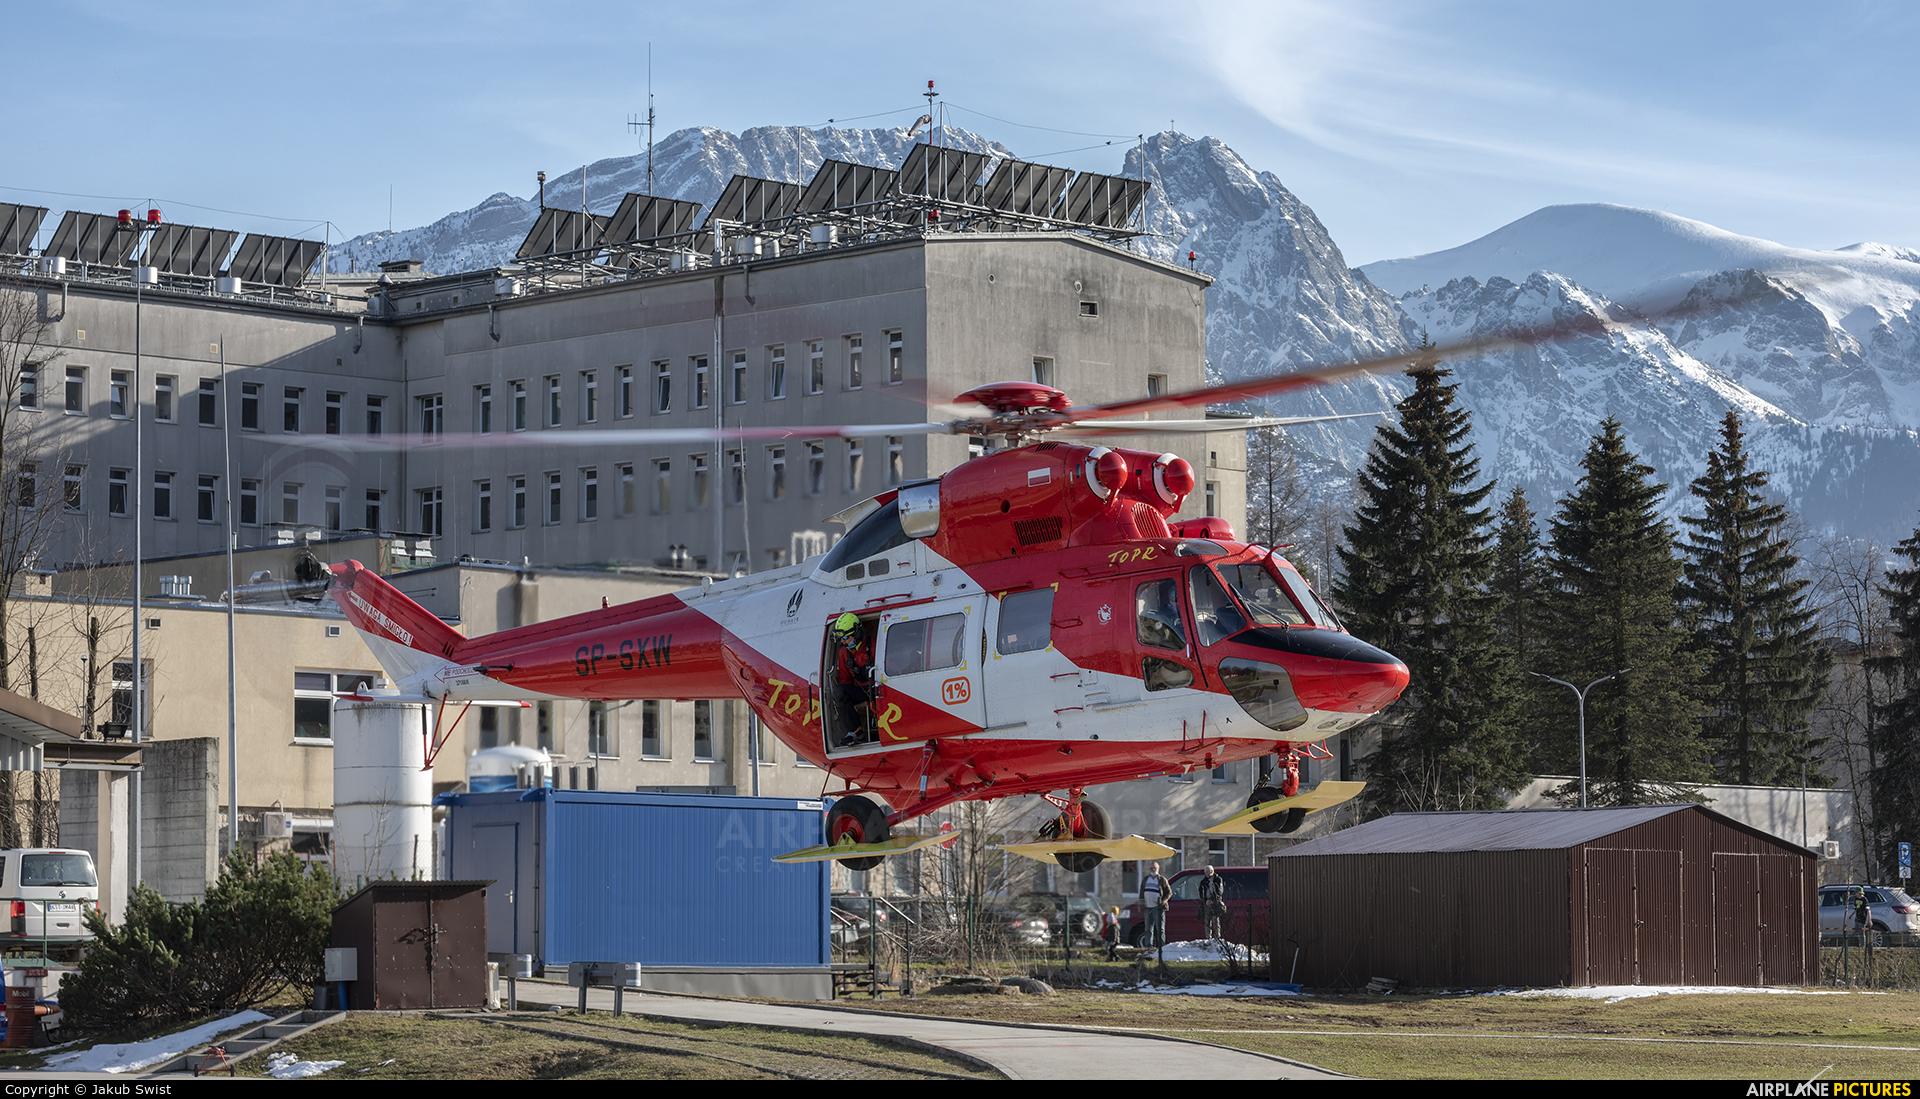 Tatrzanskie Ochotnicze Pogotowie Ratunkowe SP-SXW aircraft at Zakopane, Landing Site of Tatra Volunteer Ambulance Service - Poviat Hospital